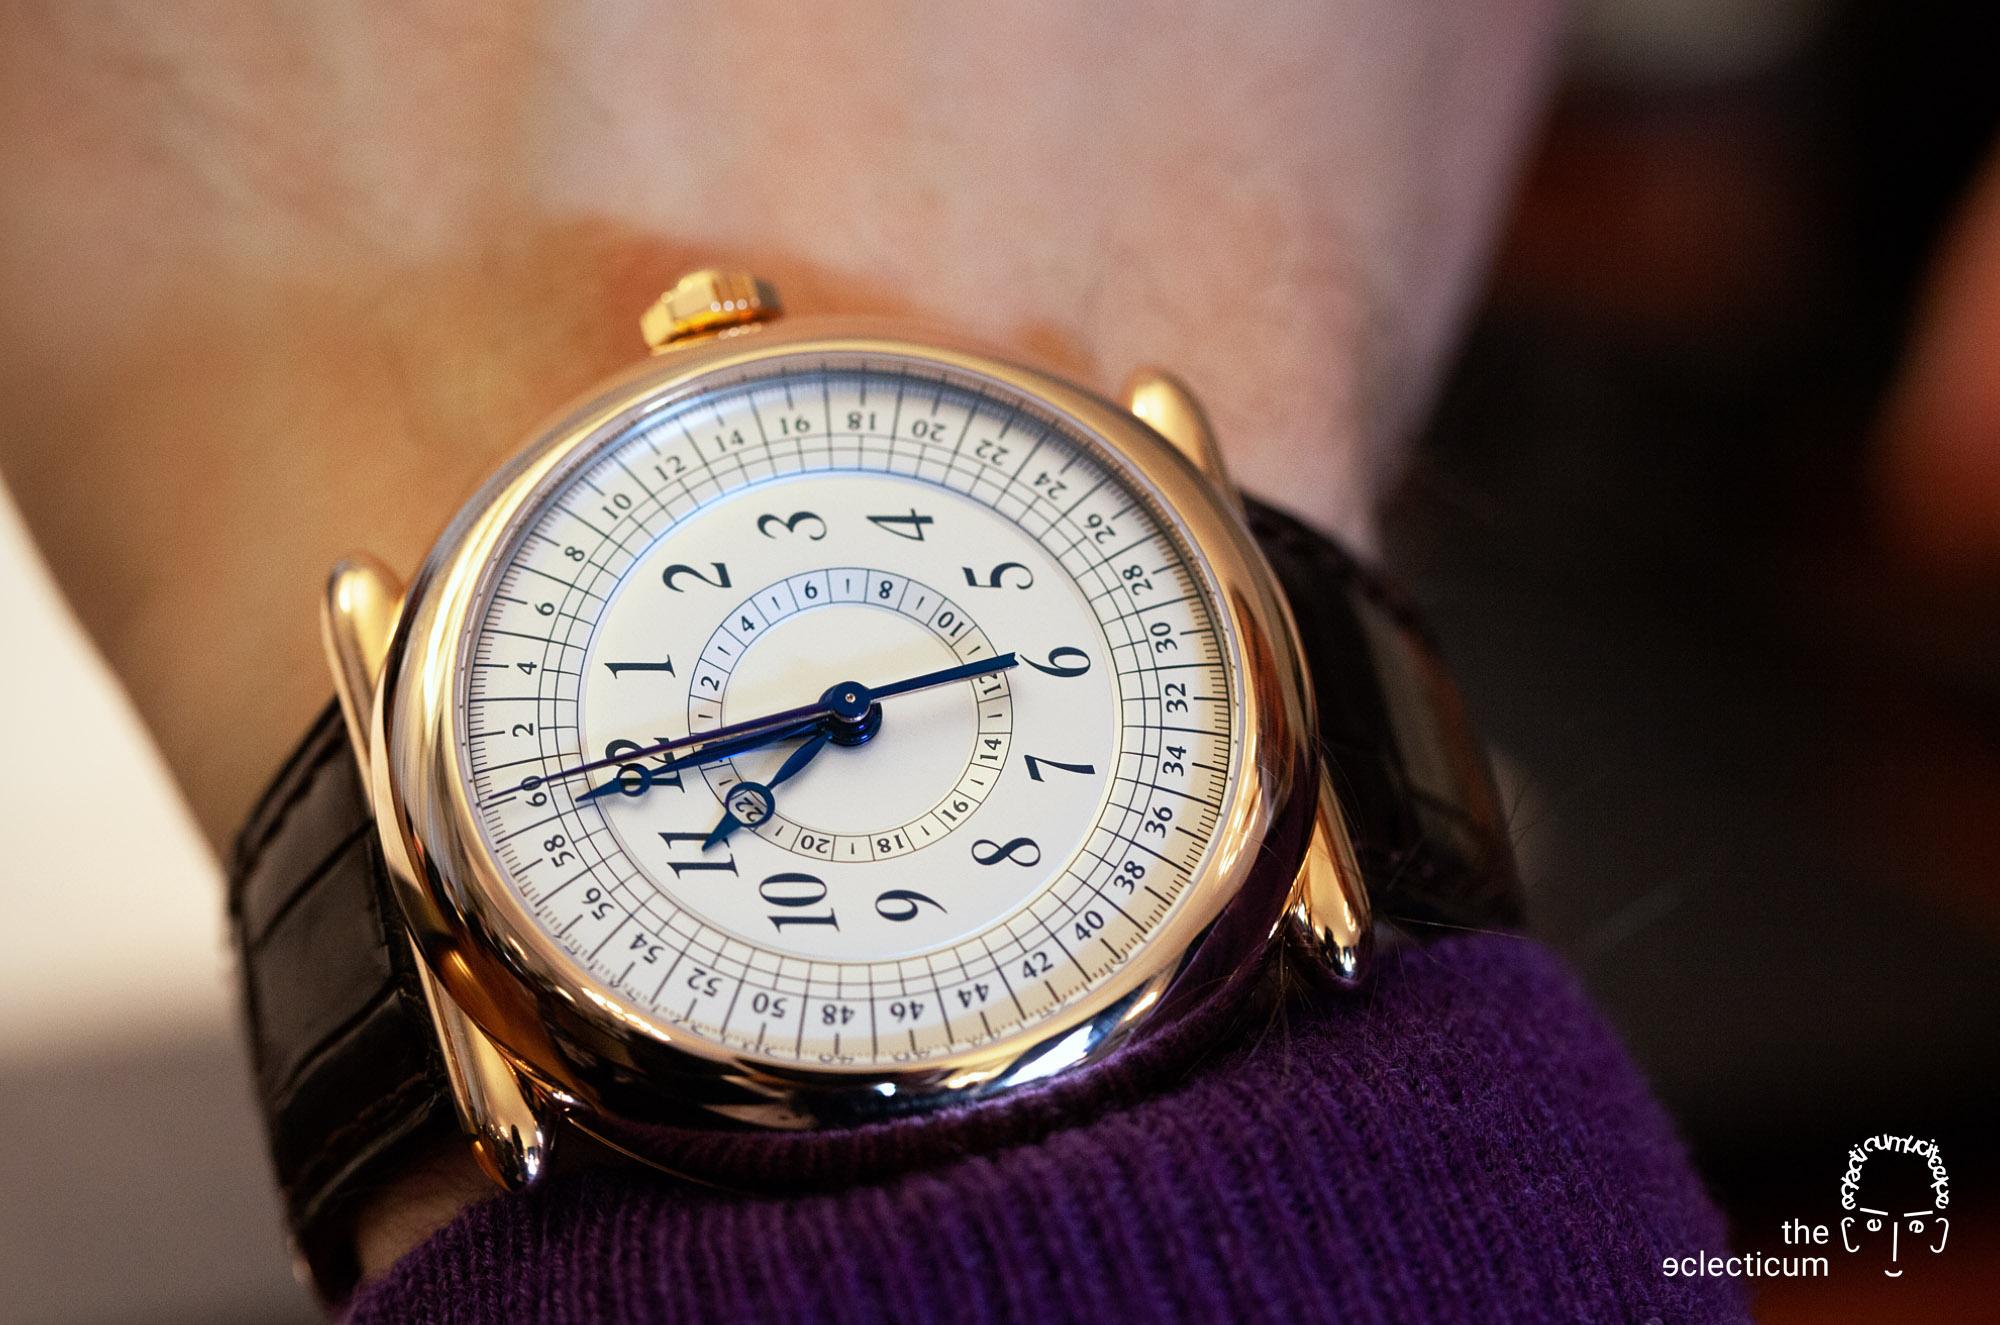 De Bethune DB29 MaxiChrono Tourbillon chronograph central stack manufacture wristshot